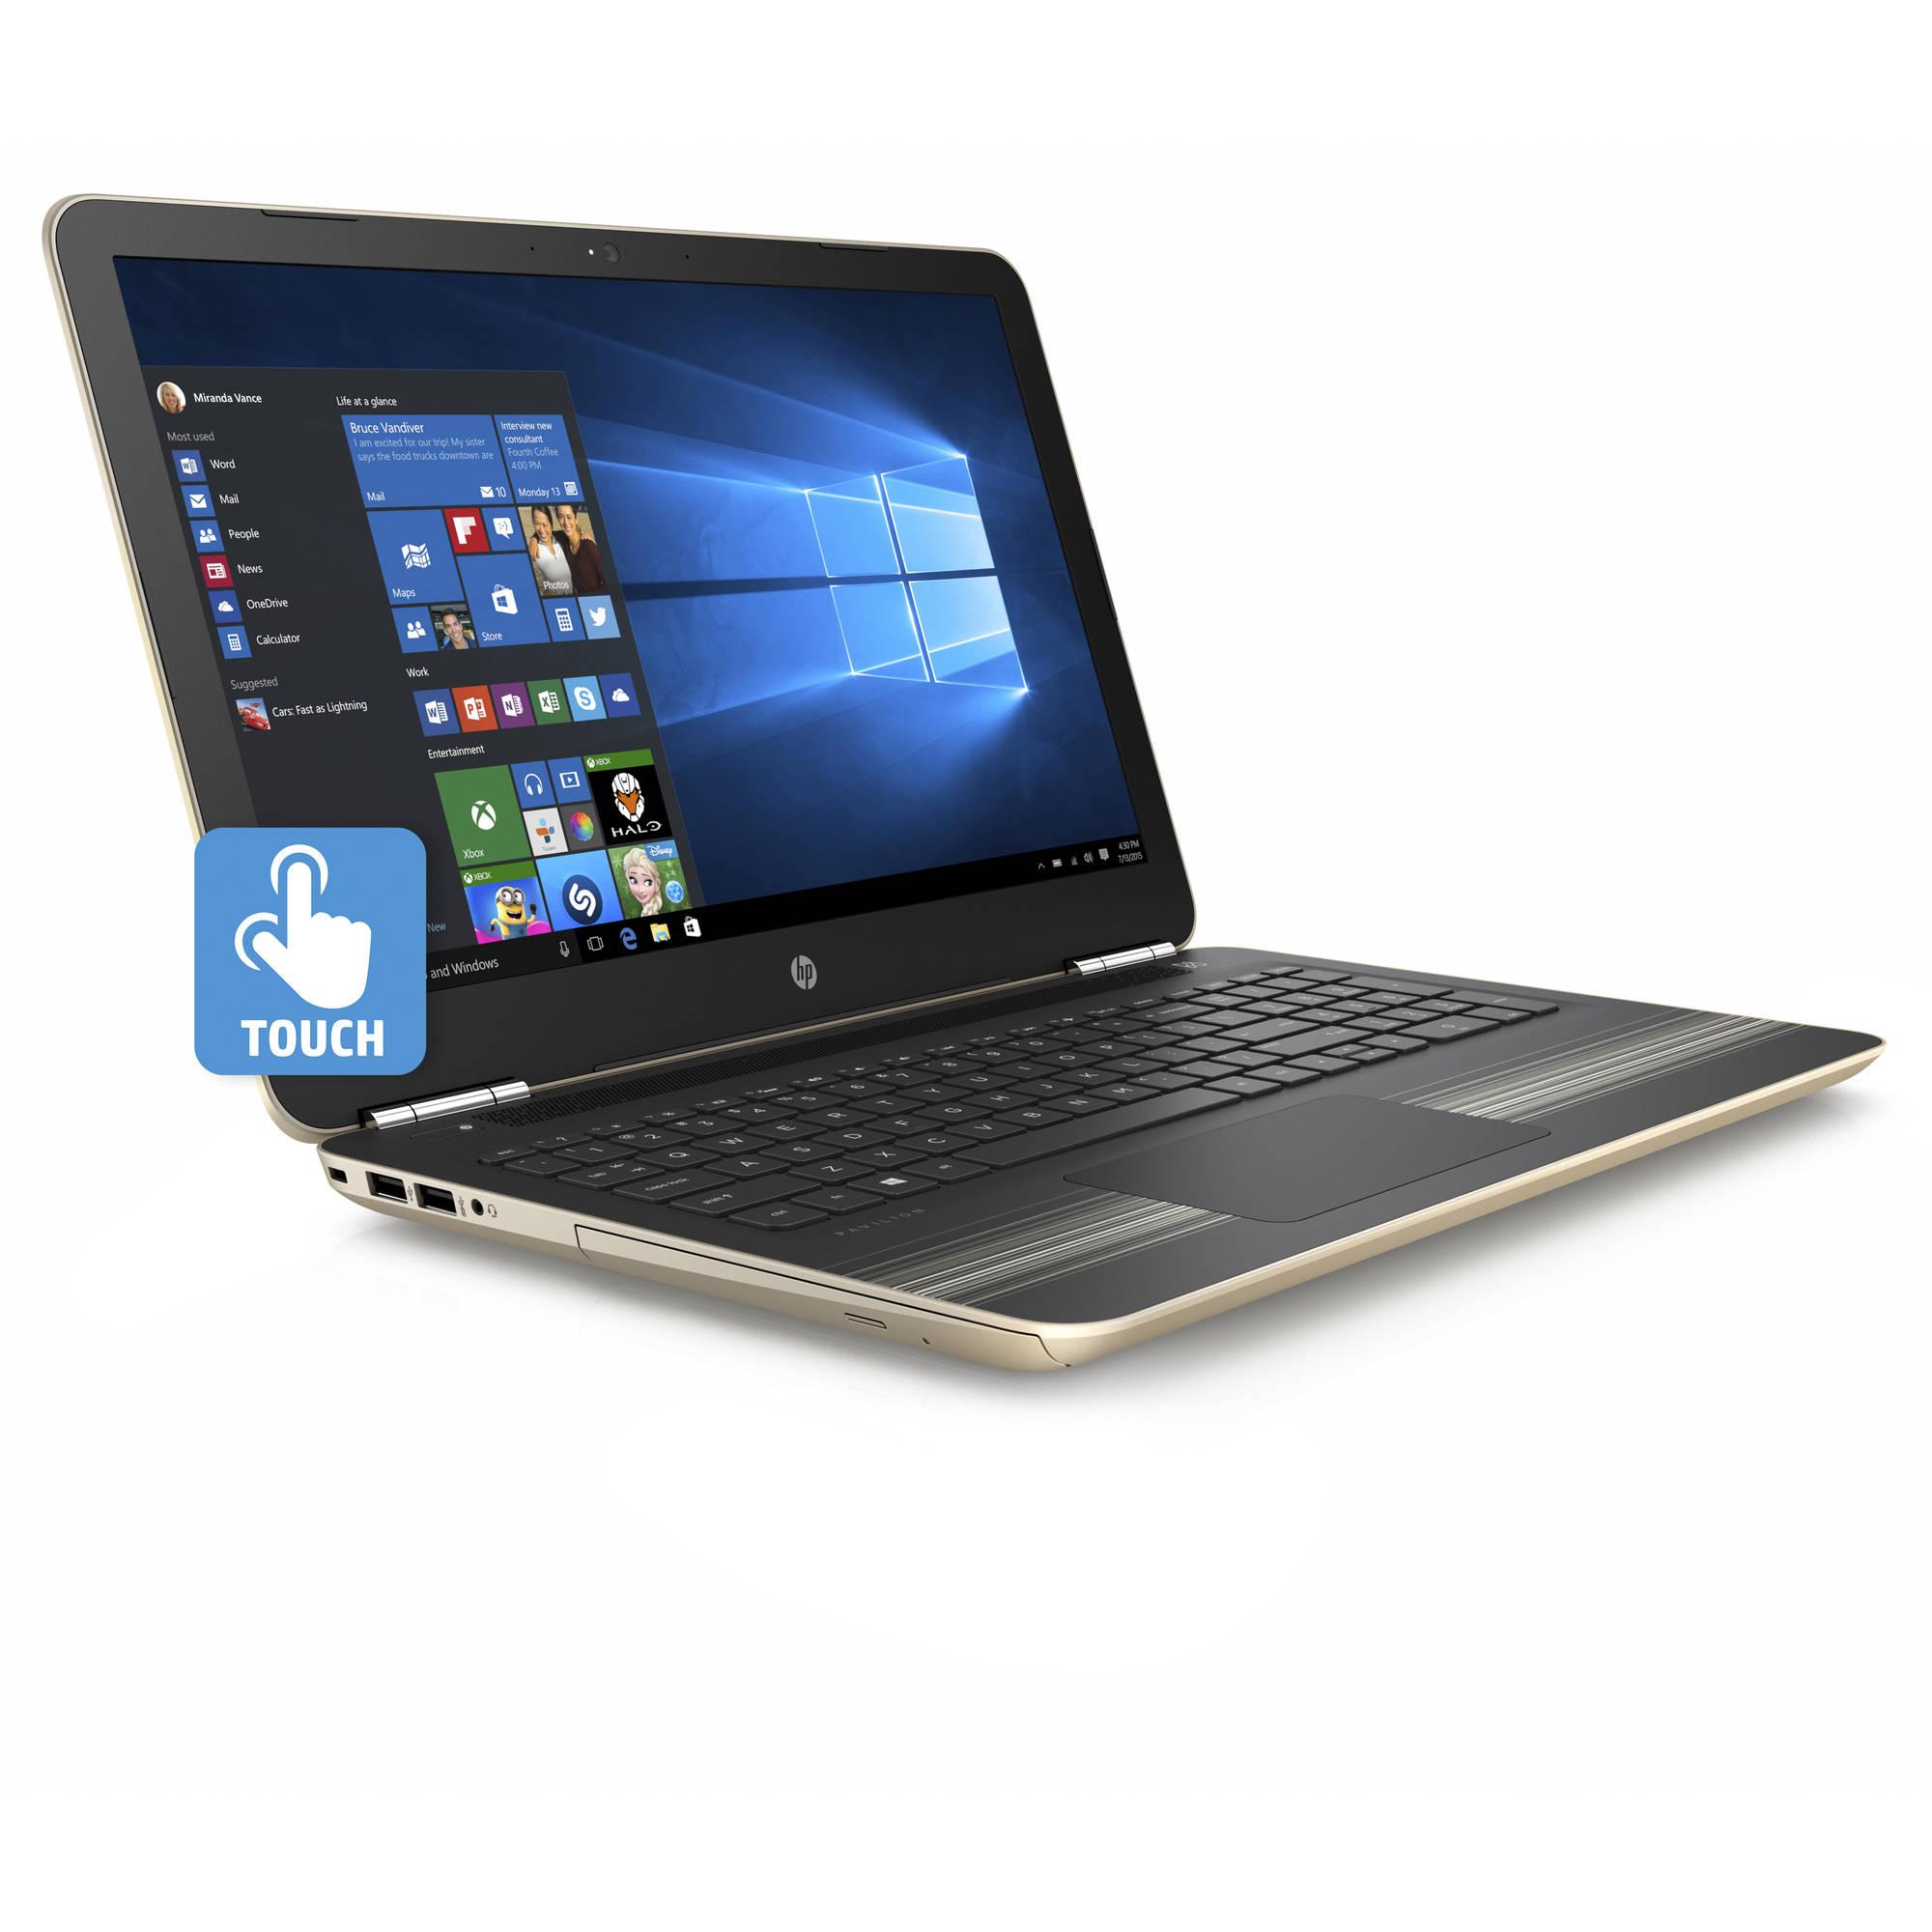 Hp pavilion 15 au030wm 15 6 manhattan gold laptop touch screen windows 10 intel core i5 6200u processor 8gb memory 1tb hard drive walmart com